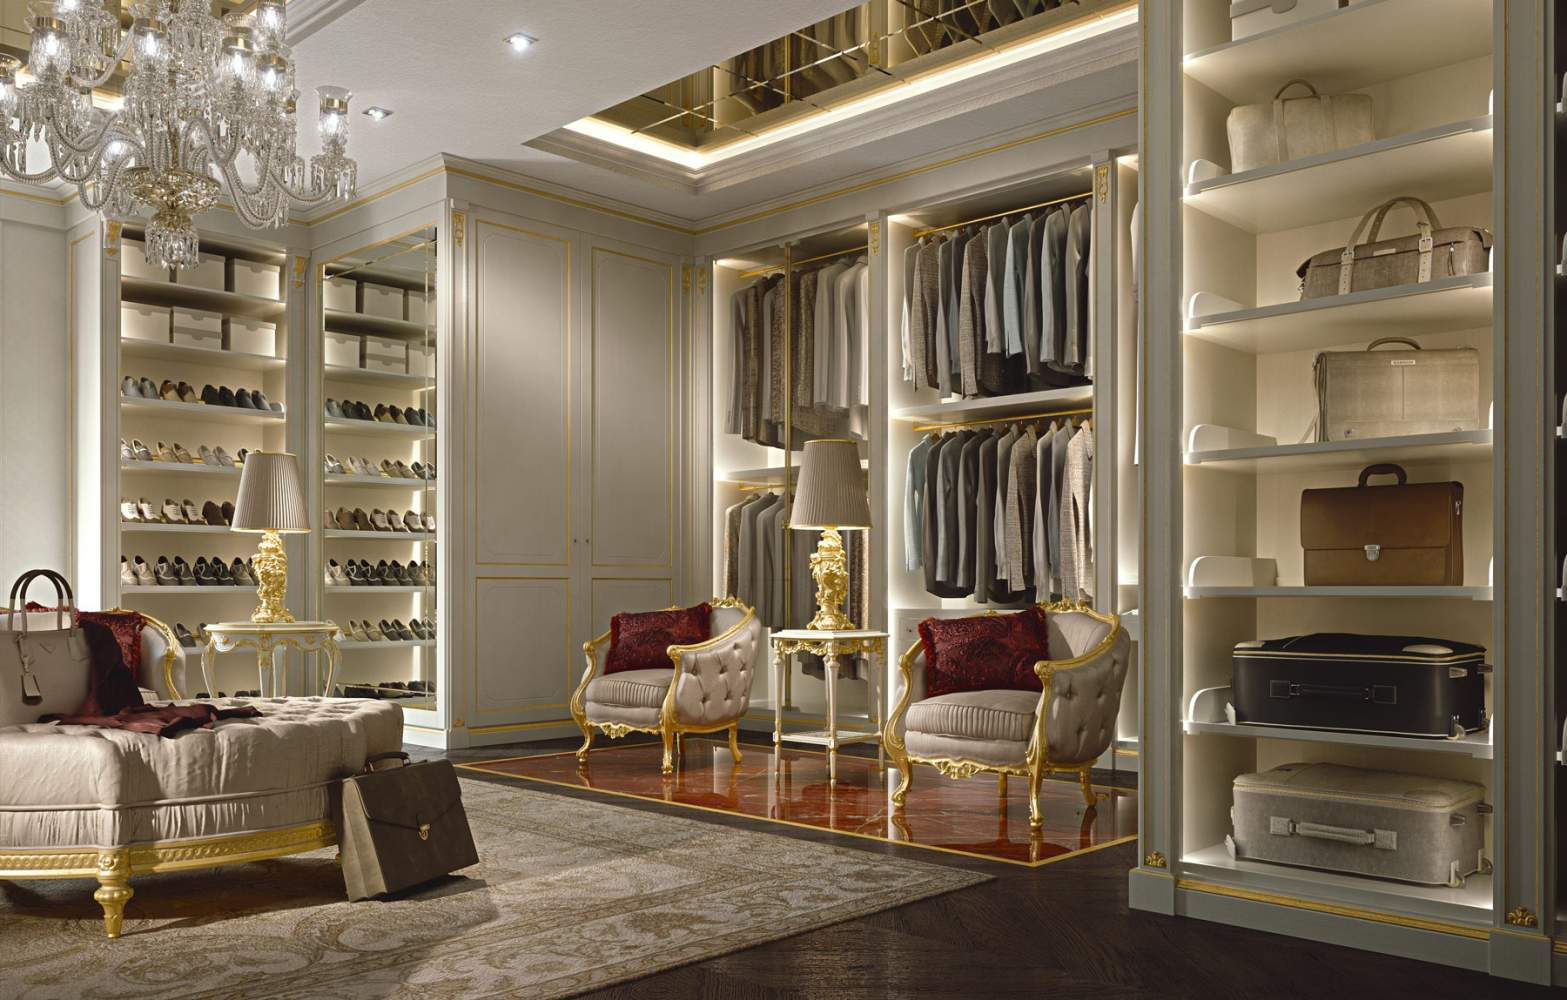 Well-organized walk-in closet wardrobe